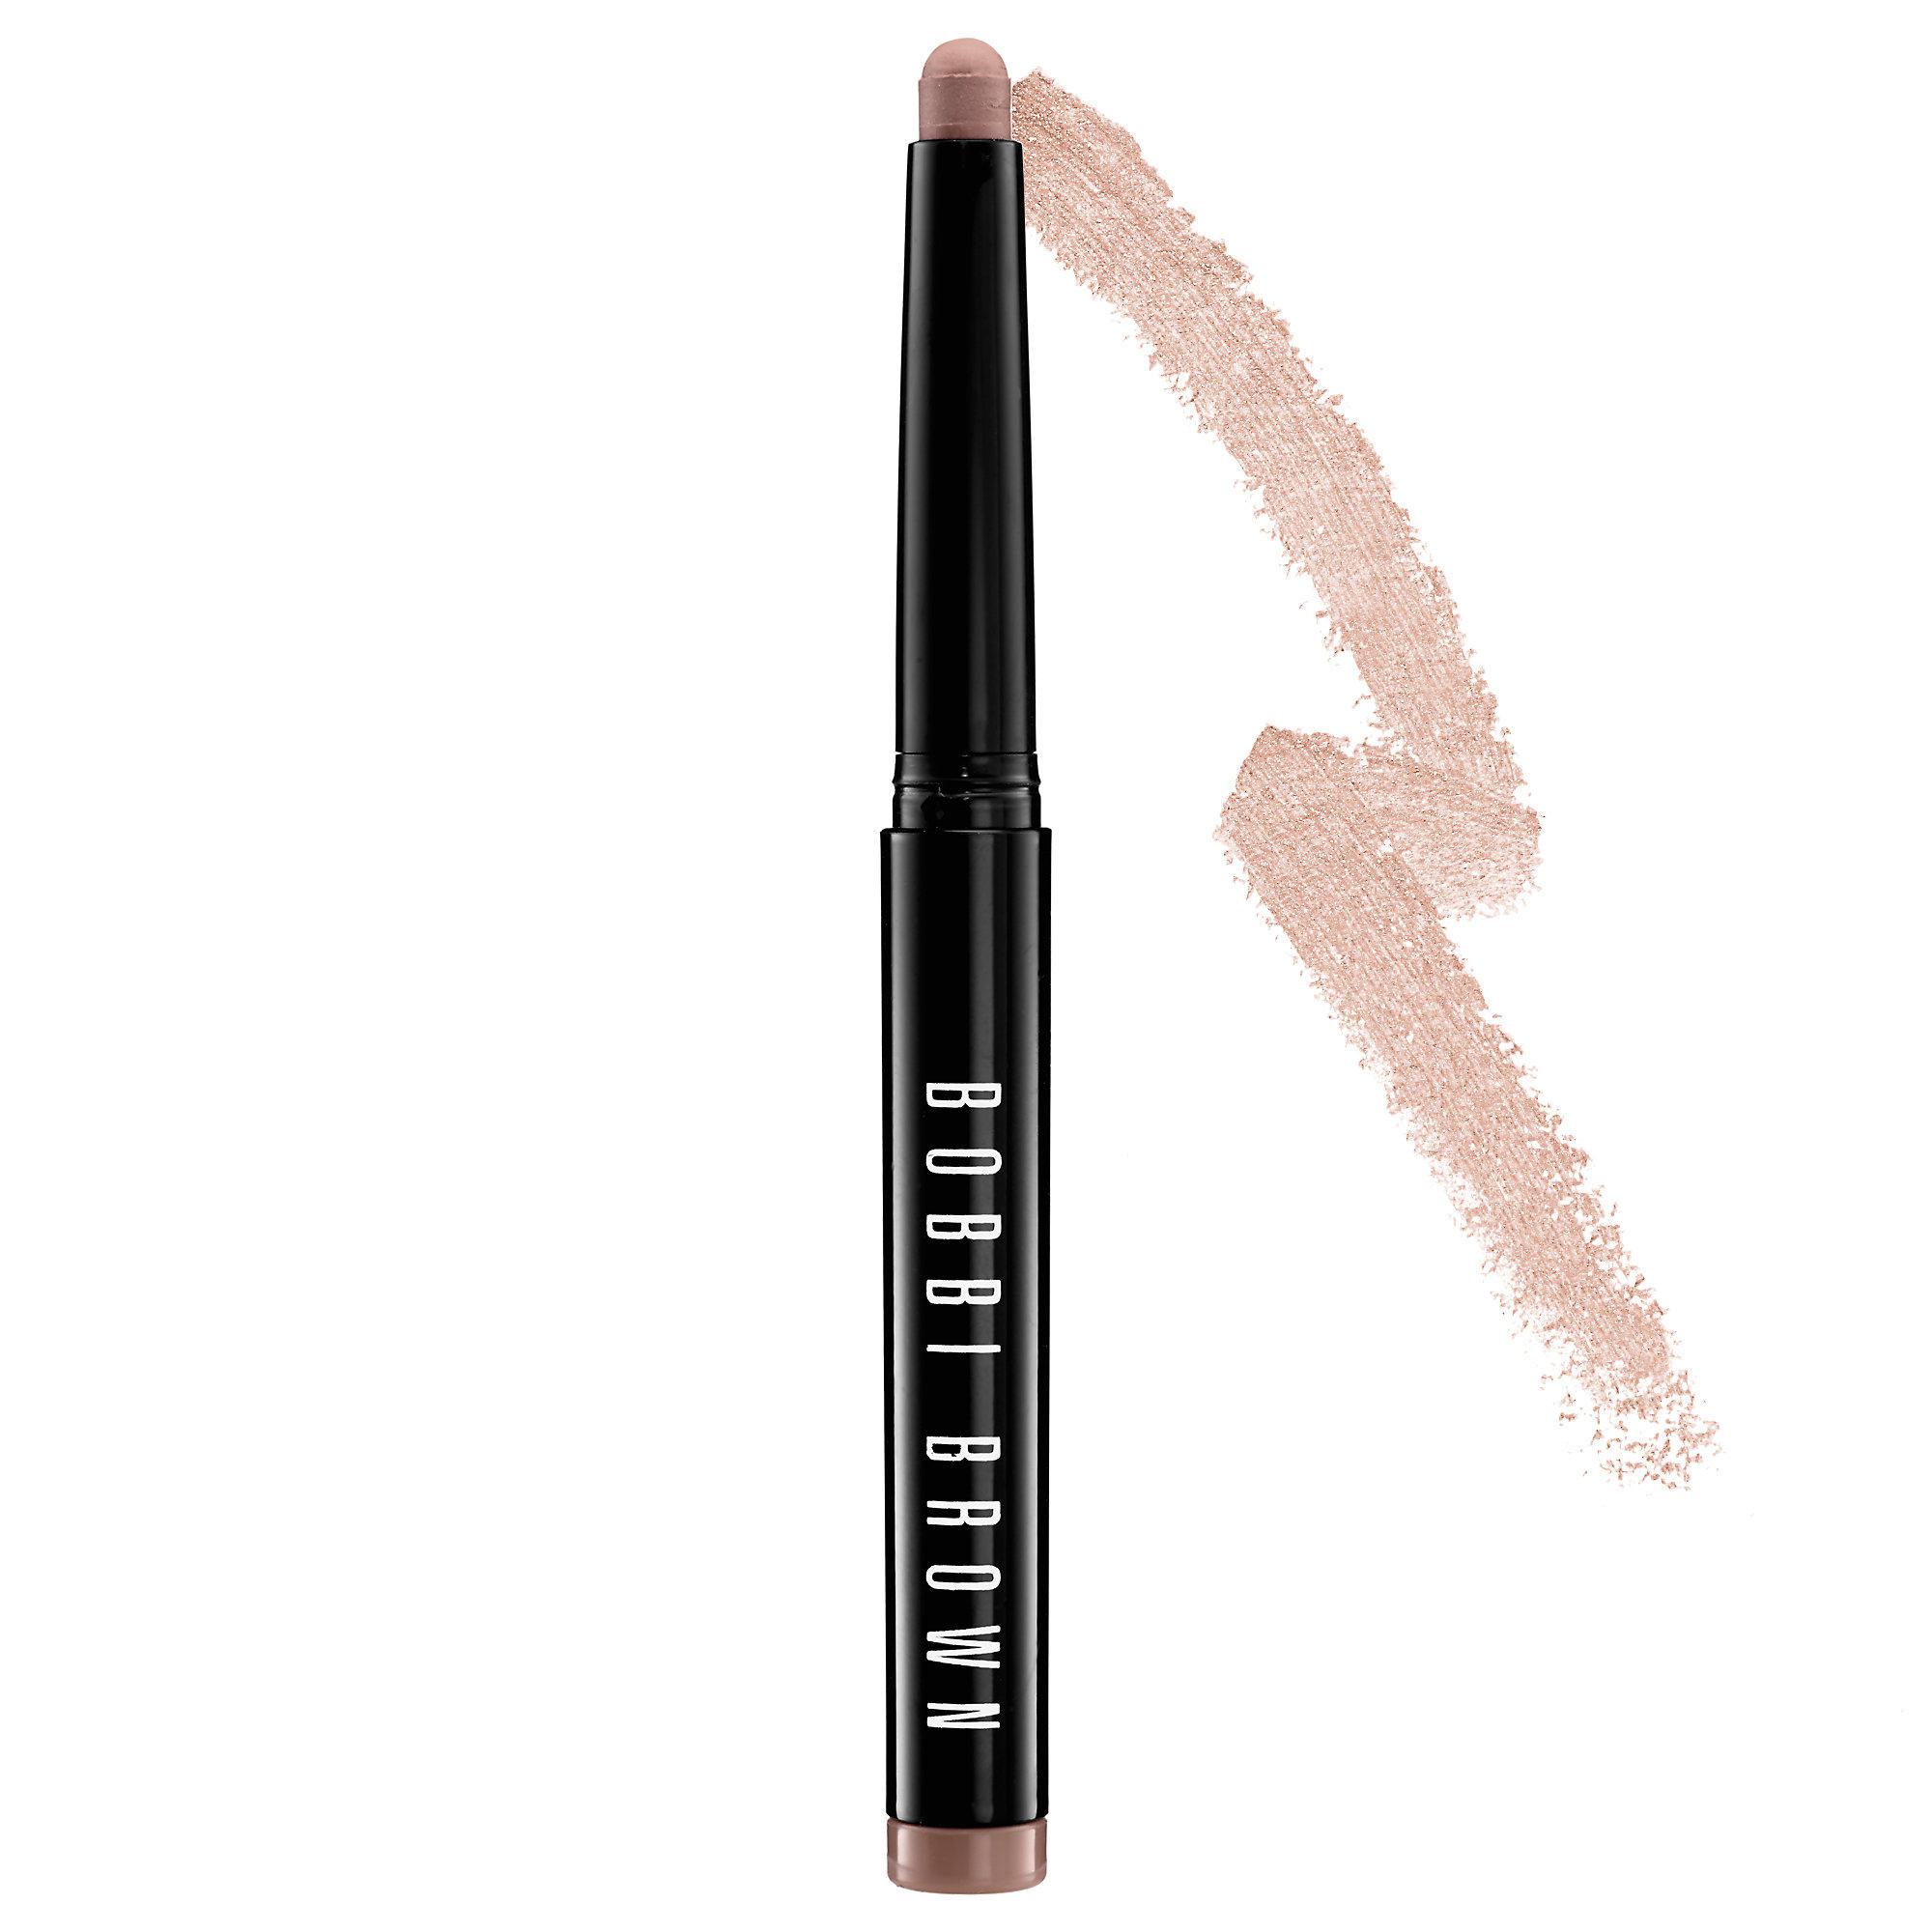 Bobbi Brown Long-Wear Cream Shadow Stick Sand Dune